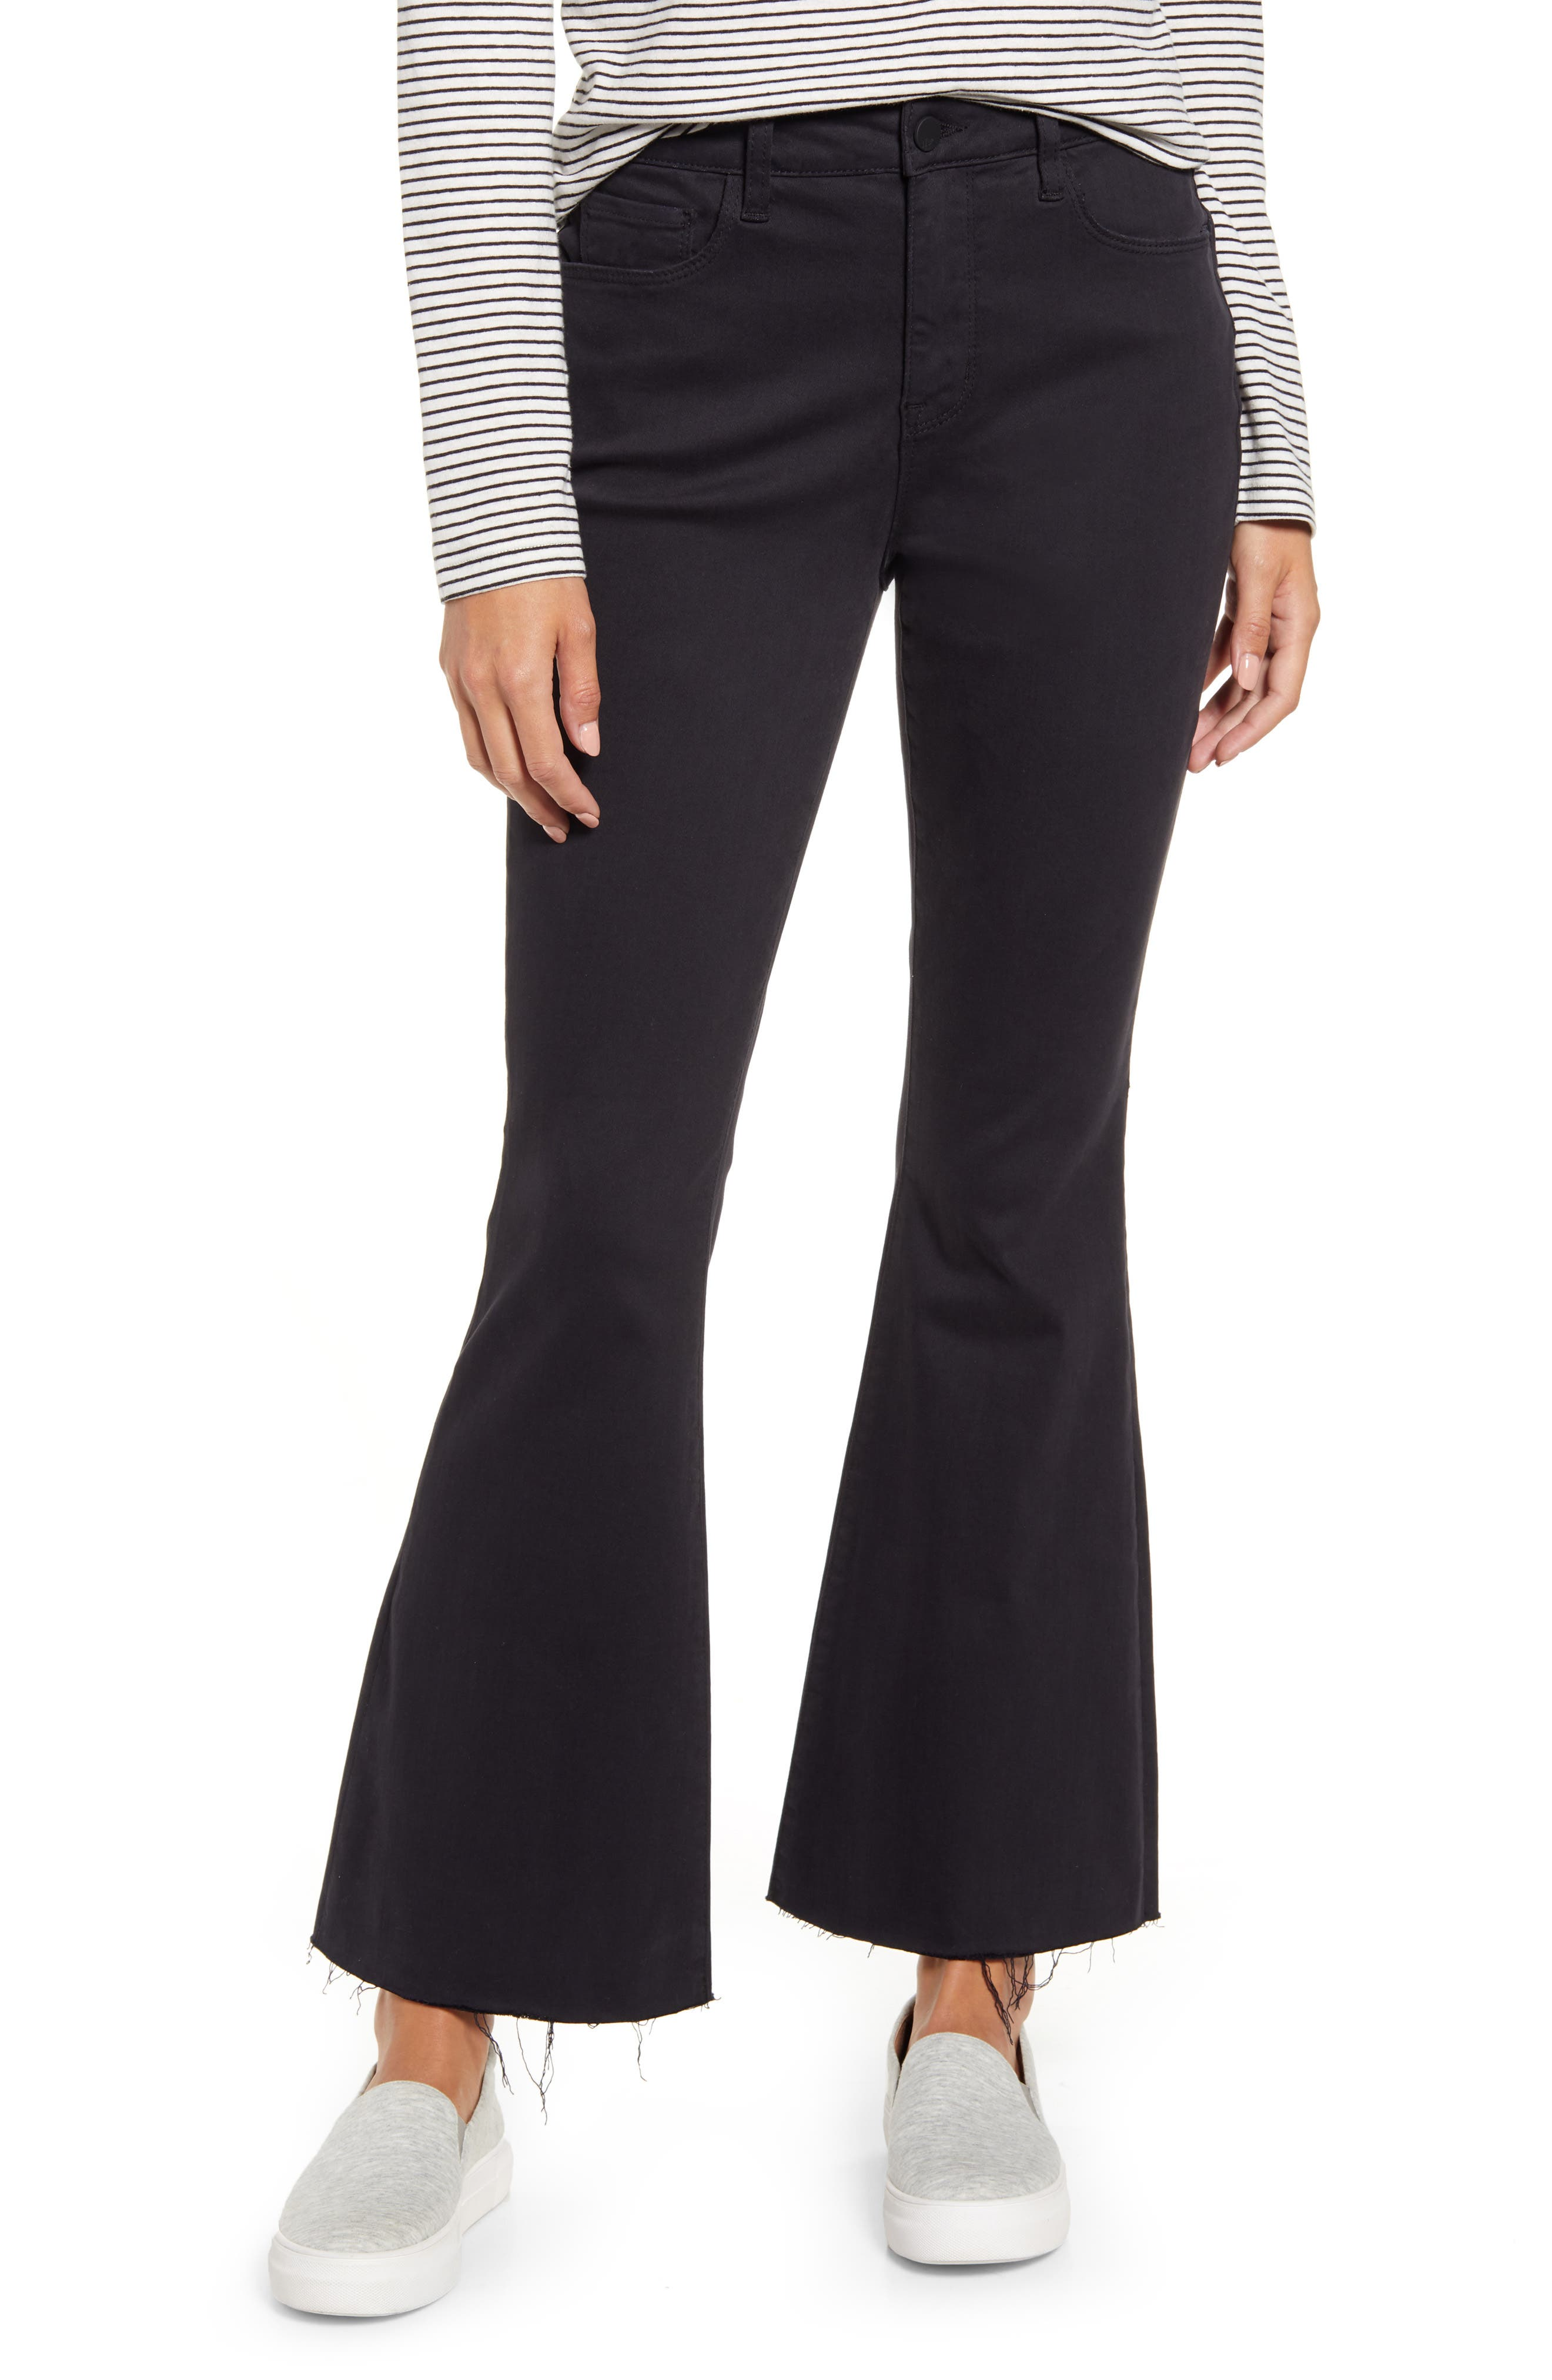 60s – 70s Pants, Jeans, Hippie, Bell Bottoms, Jumpsuits Womens Wash Lab Kick Flare Jeans $98.00 AT vintagedancer.com